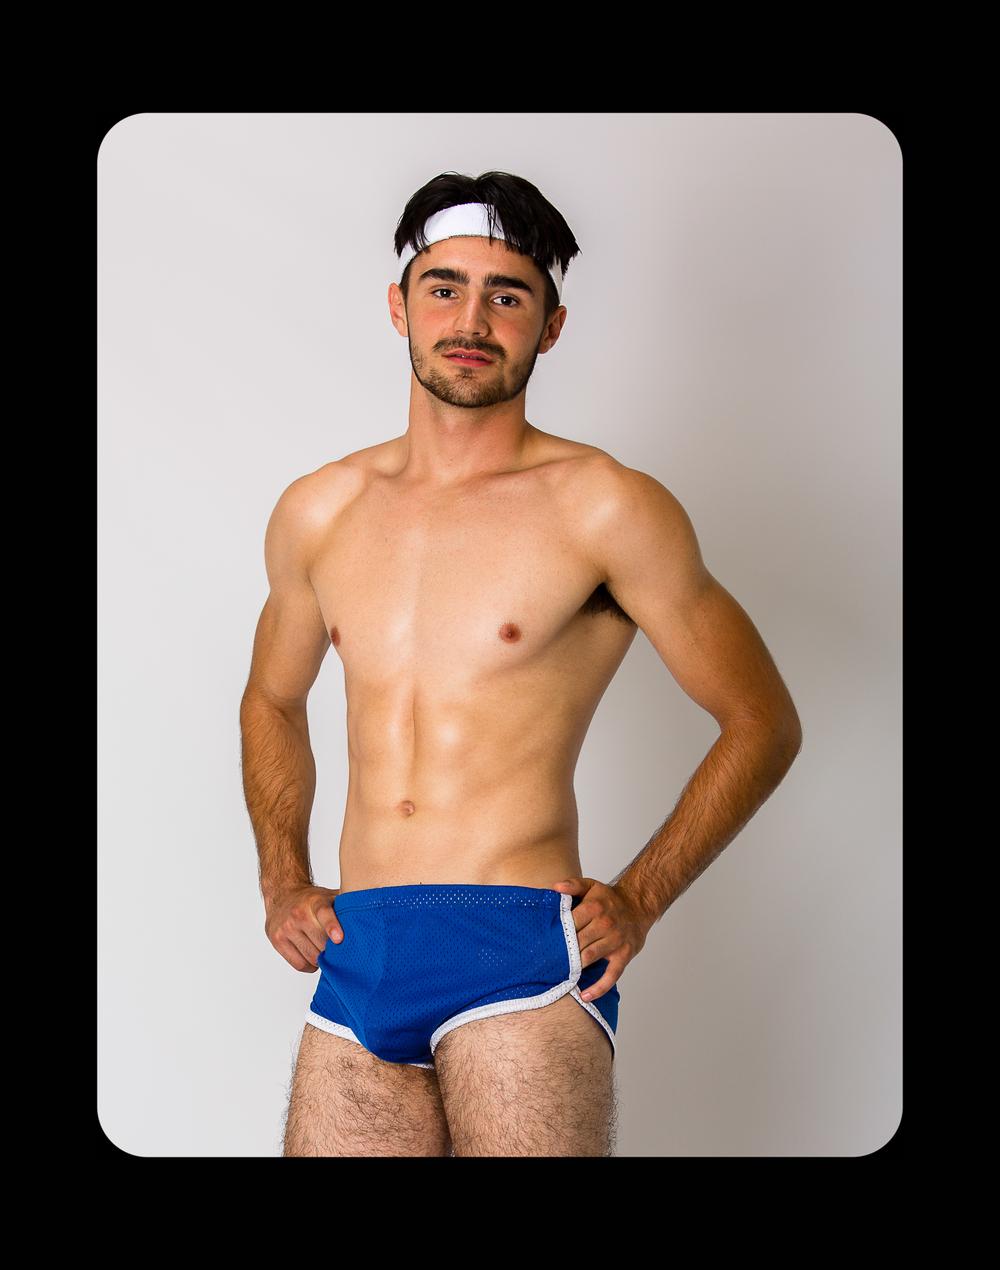 Raul Flores Desins Mens Underwear 2015-1 (dragged) 3.jpg